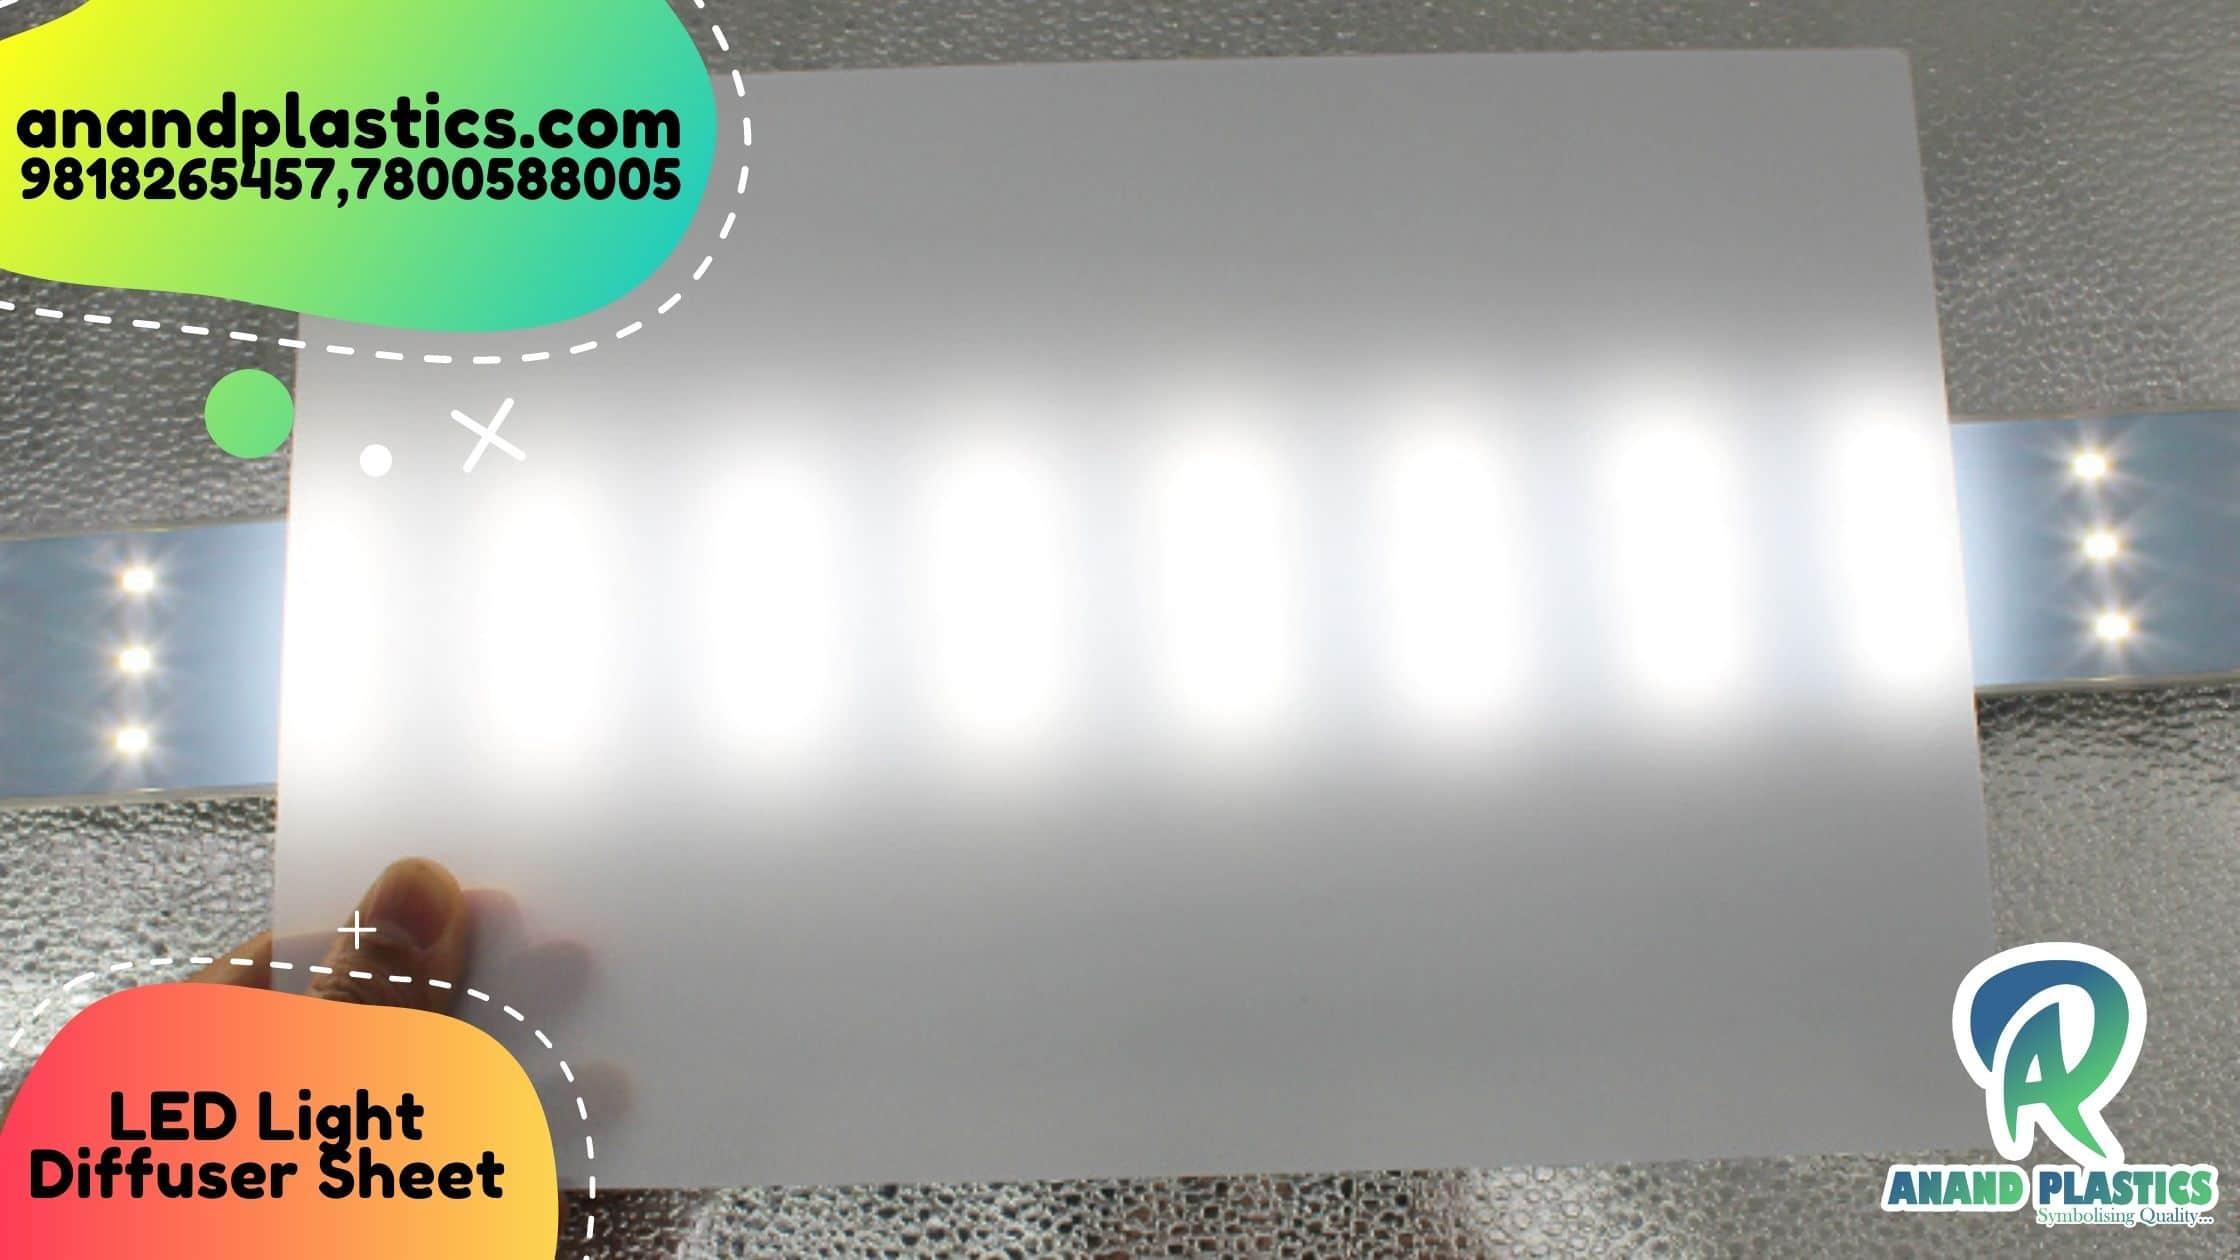 anand plastics, polycarbonate sheet, solid polycarbnoate sheet, multiwall polycarbonate sheet, roofing sheets, canopy sheet, plastic sheet, acrylic sheet, lgp, abs sheet, petg, sunboard, polystyrene sheets ,PVC SHEET, LED Light Diffuser Sheet